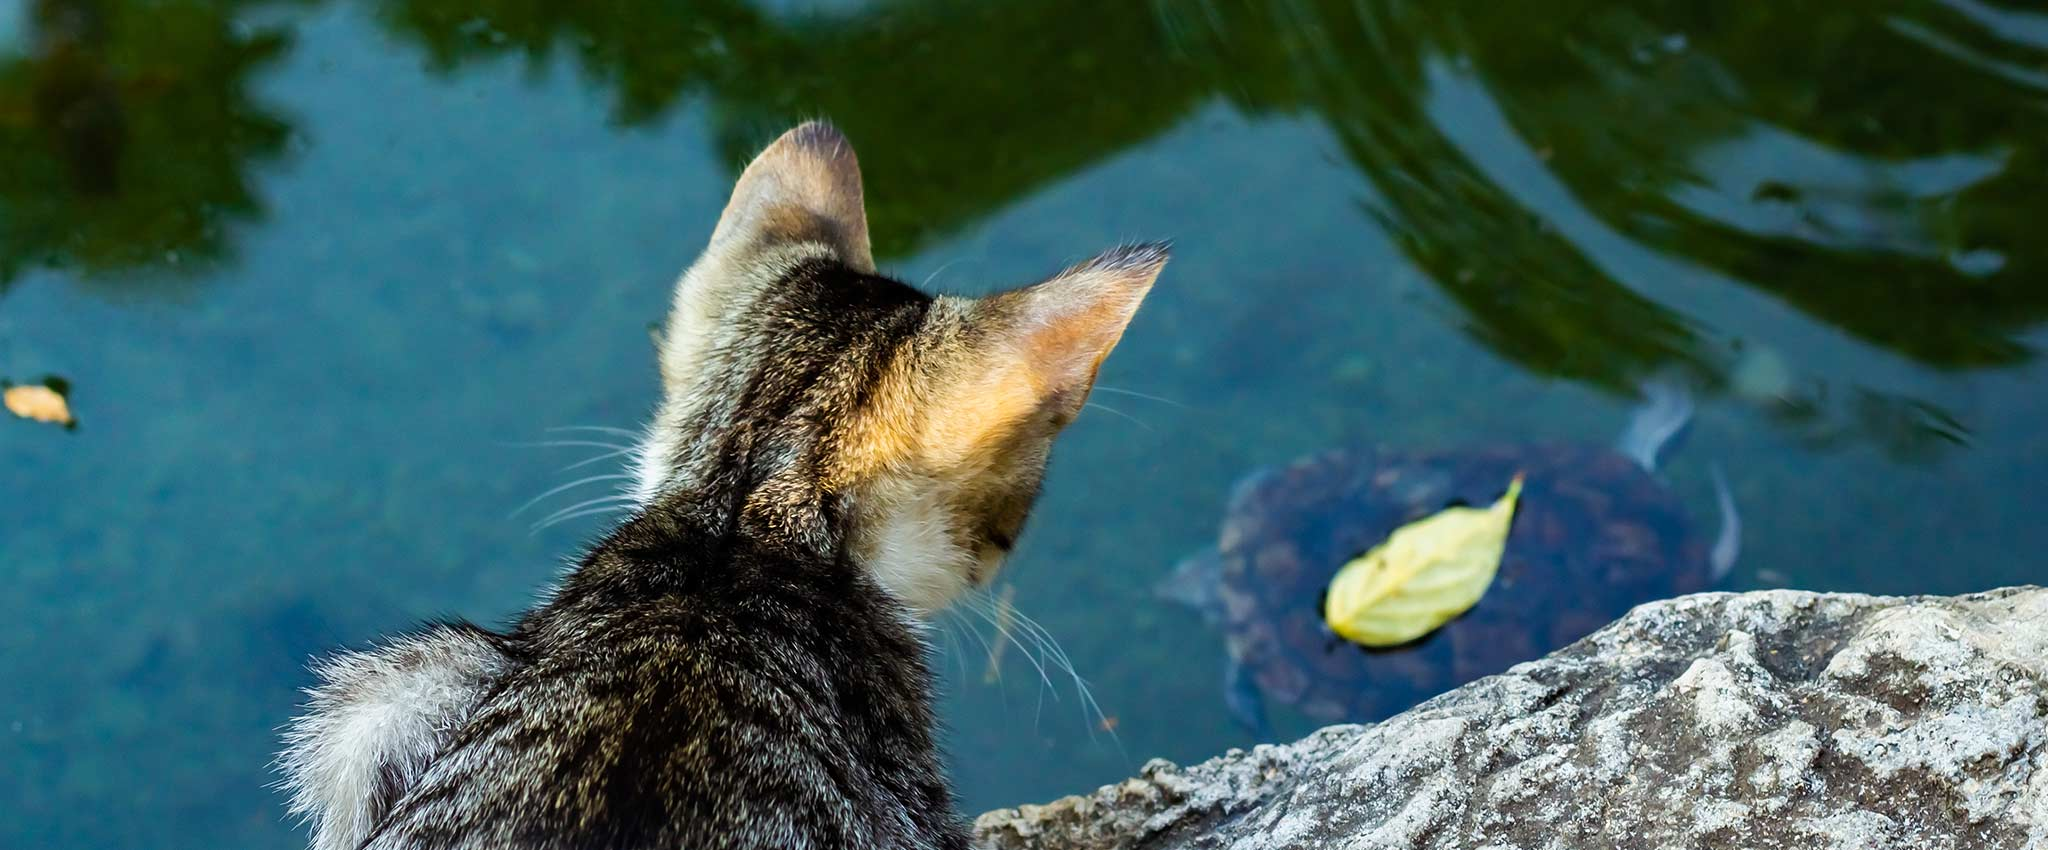 A cat next to a stream